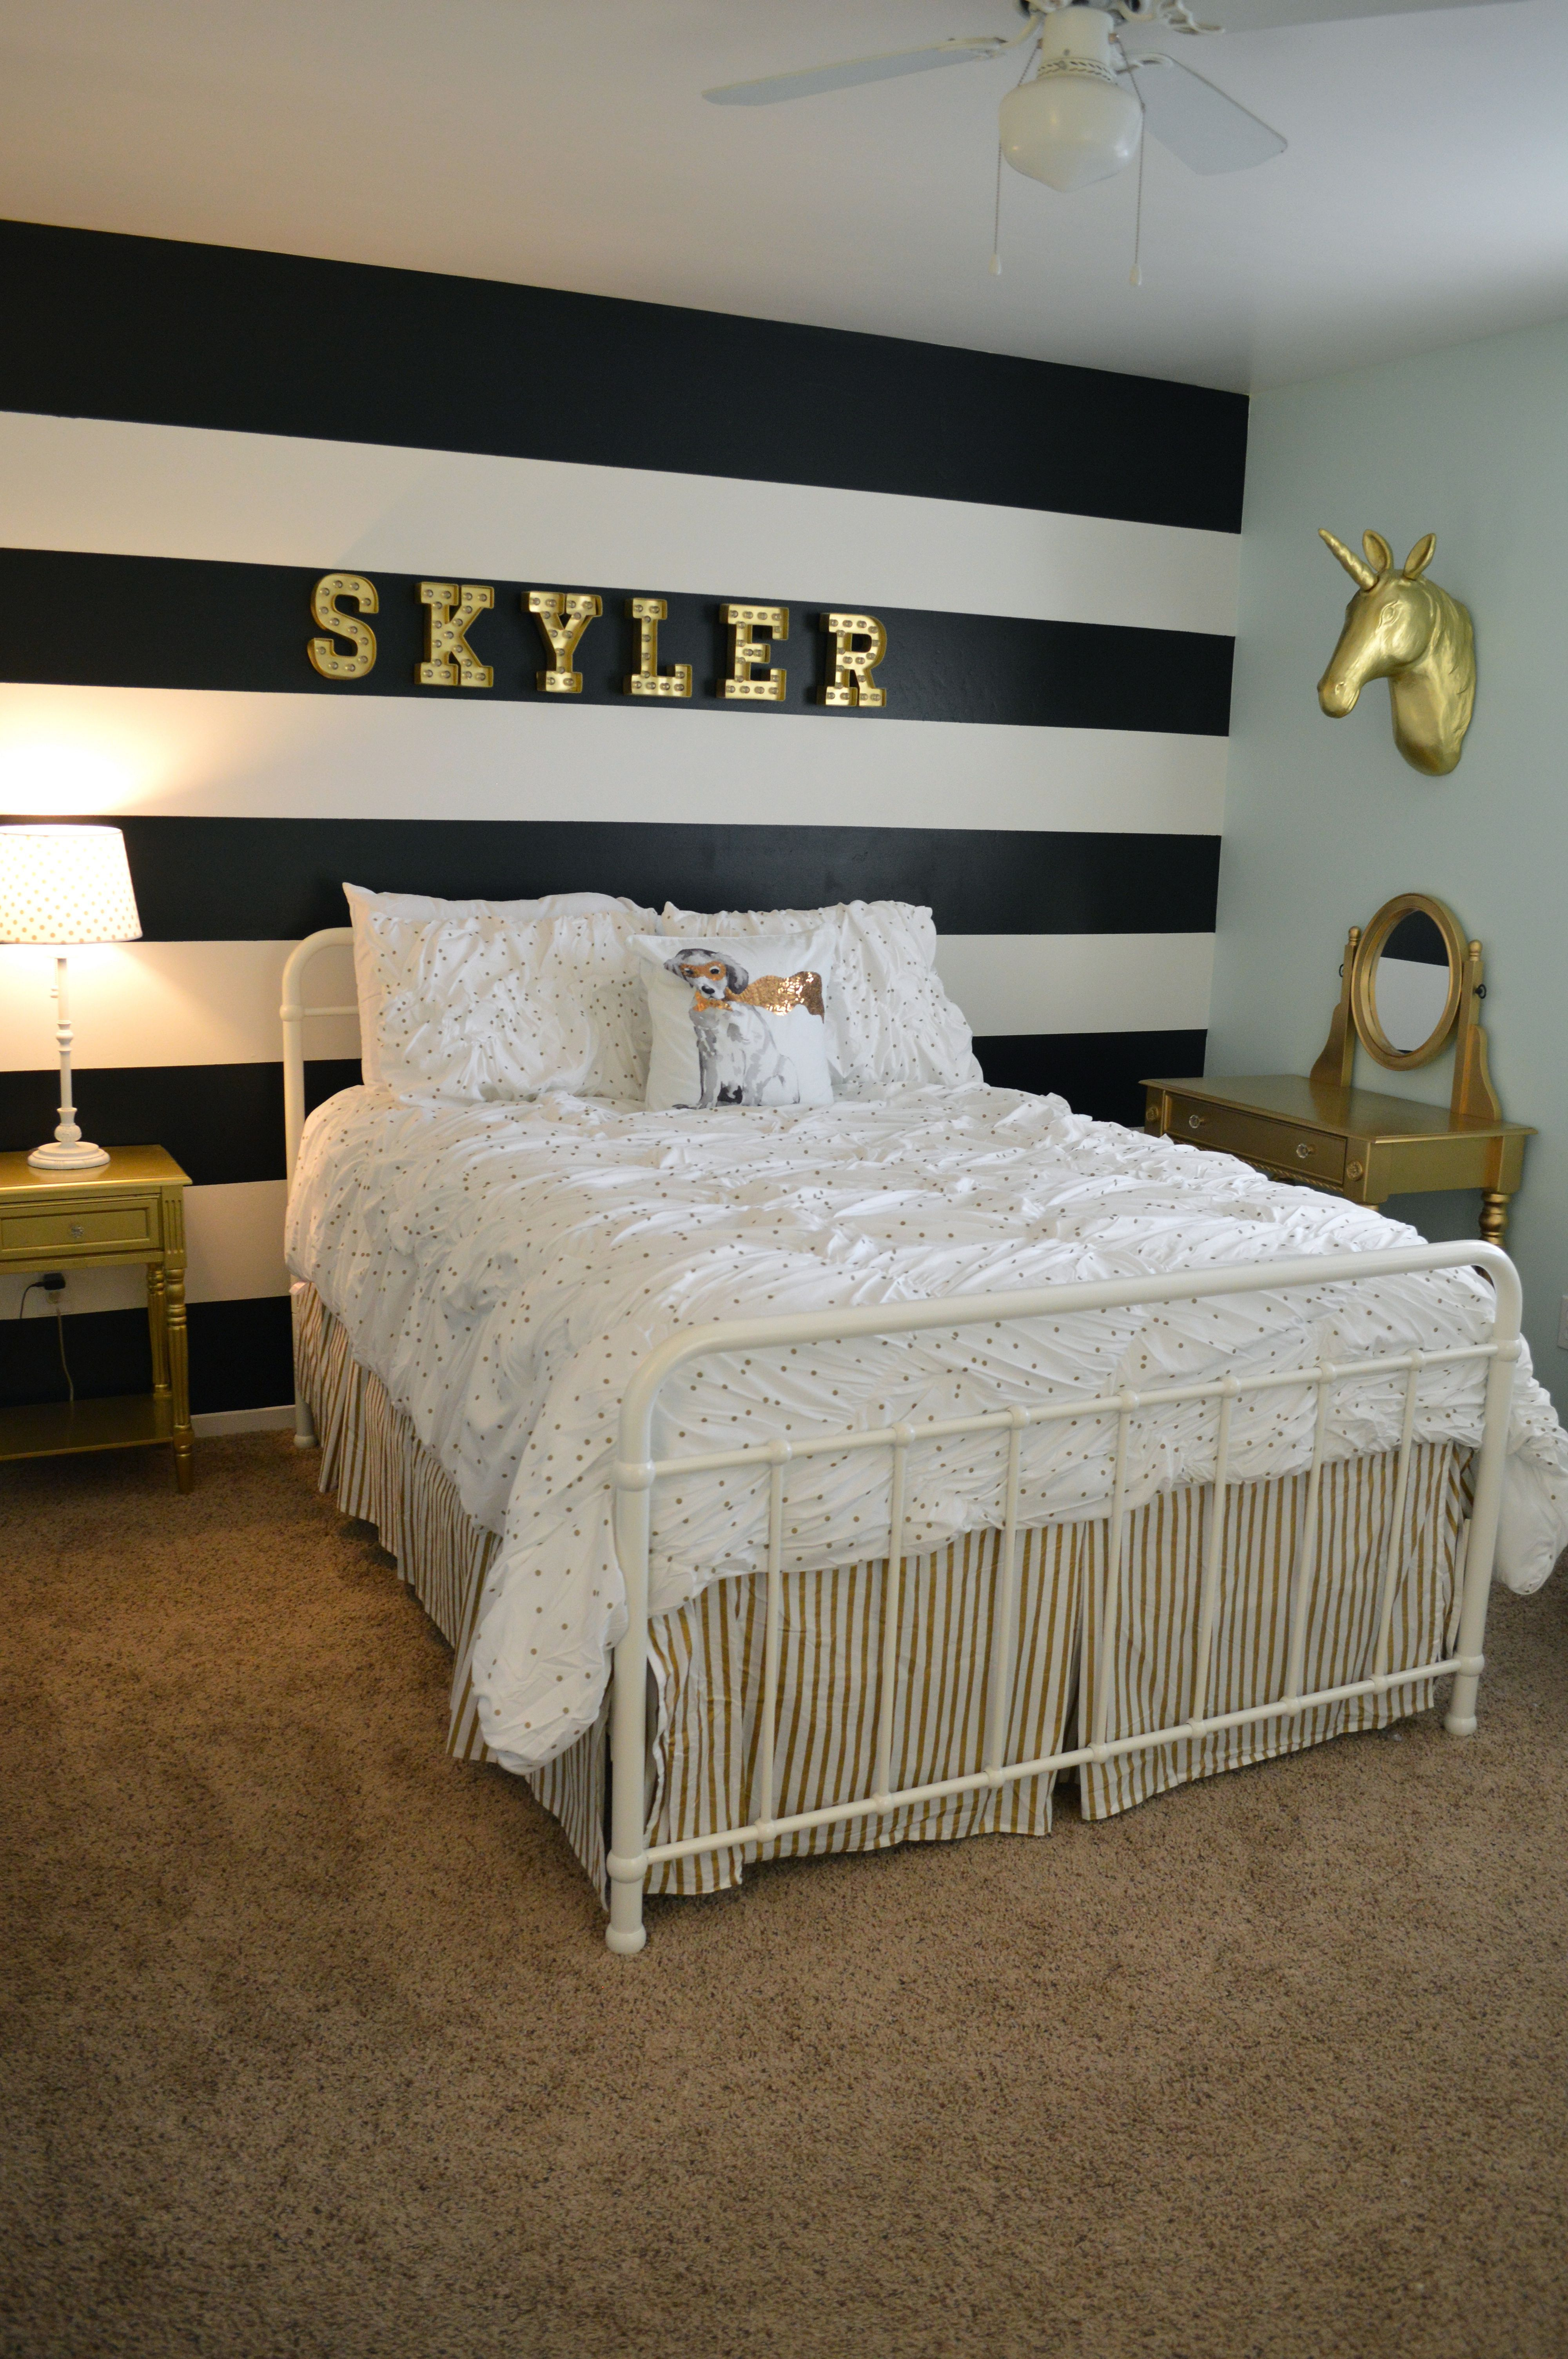 674836325385966859 In 2020 Gold Bedroom Gold Room Decor White